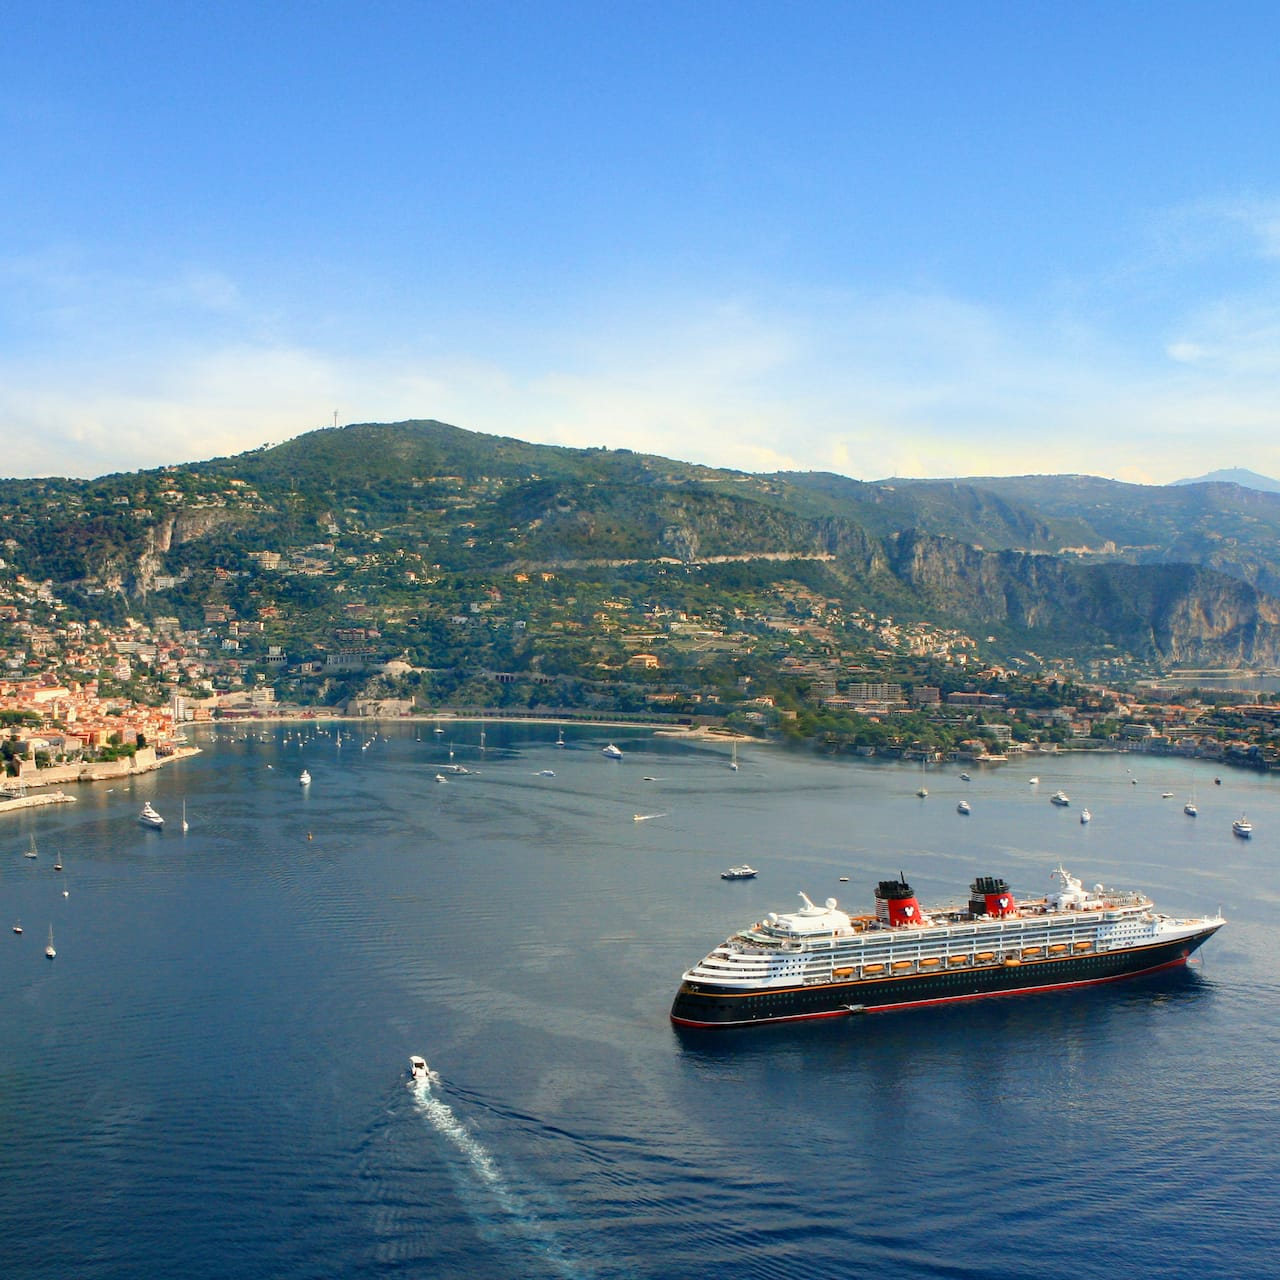 The Disney Magic cruise ship anchored in a bay